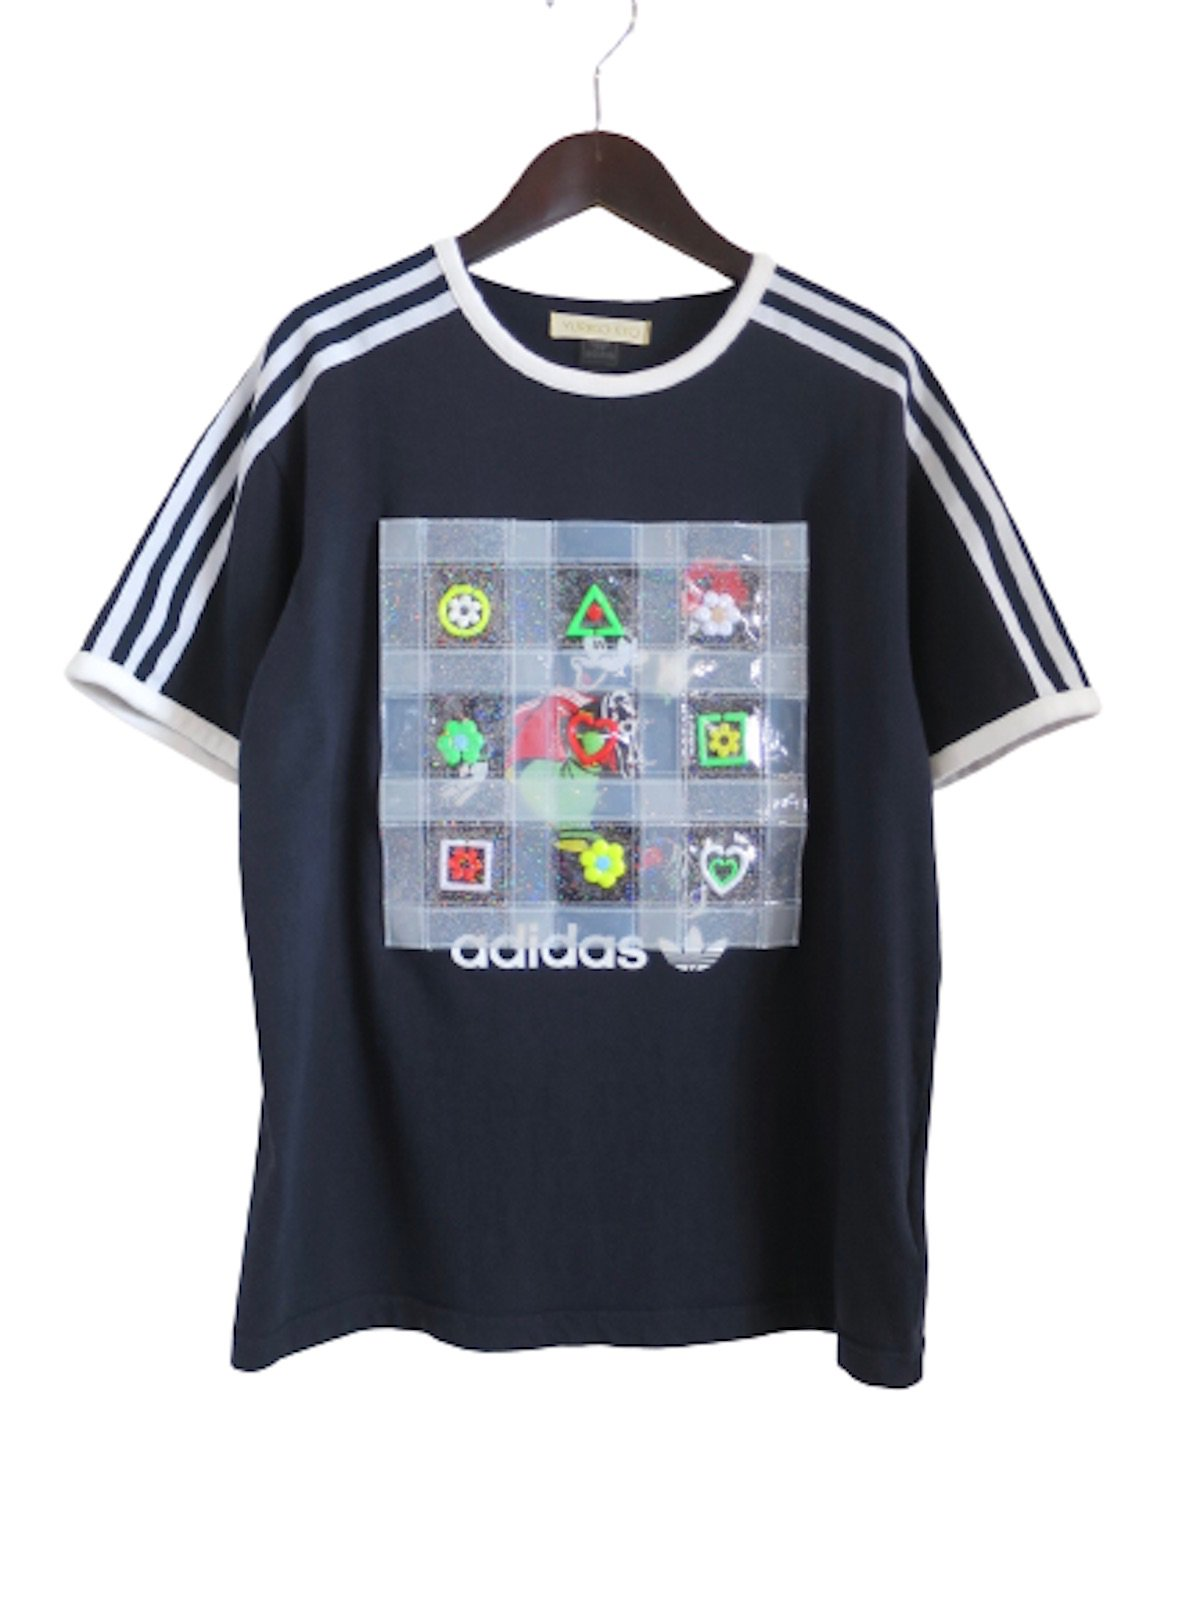 <img class='new_mark_img1' src='https://img.shop-pro.jp/img/new/icons1.gif' style='border:none;display:inline;margin:0px;padding:0px;width:auto;' />『YURIKO ETO』リメイクTシャツ